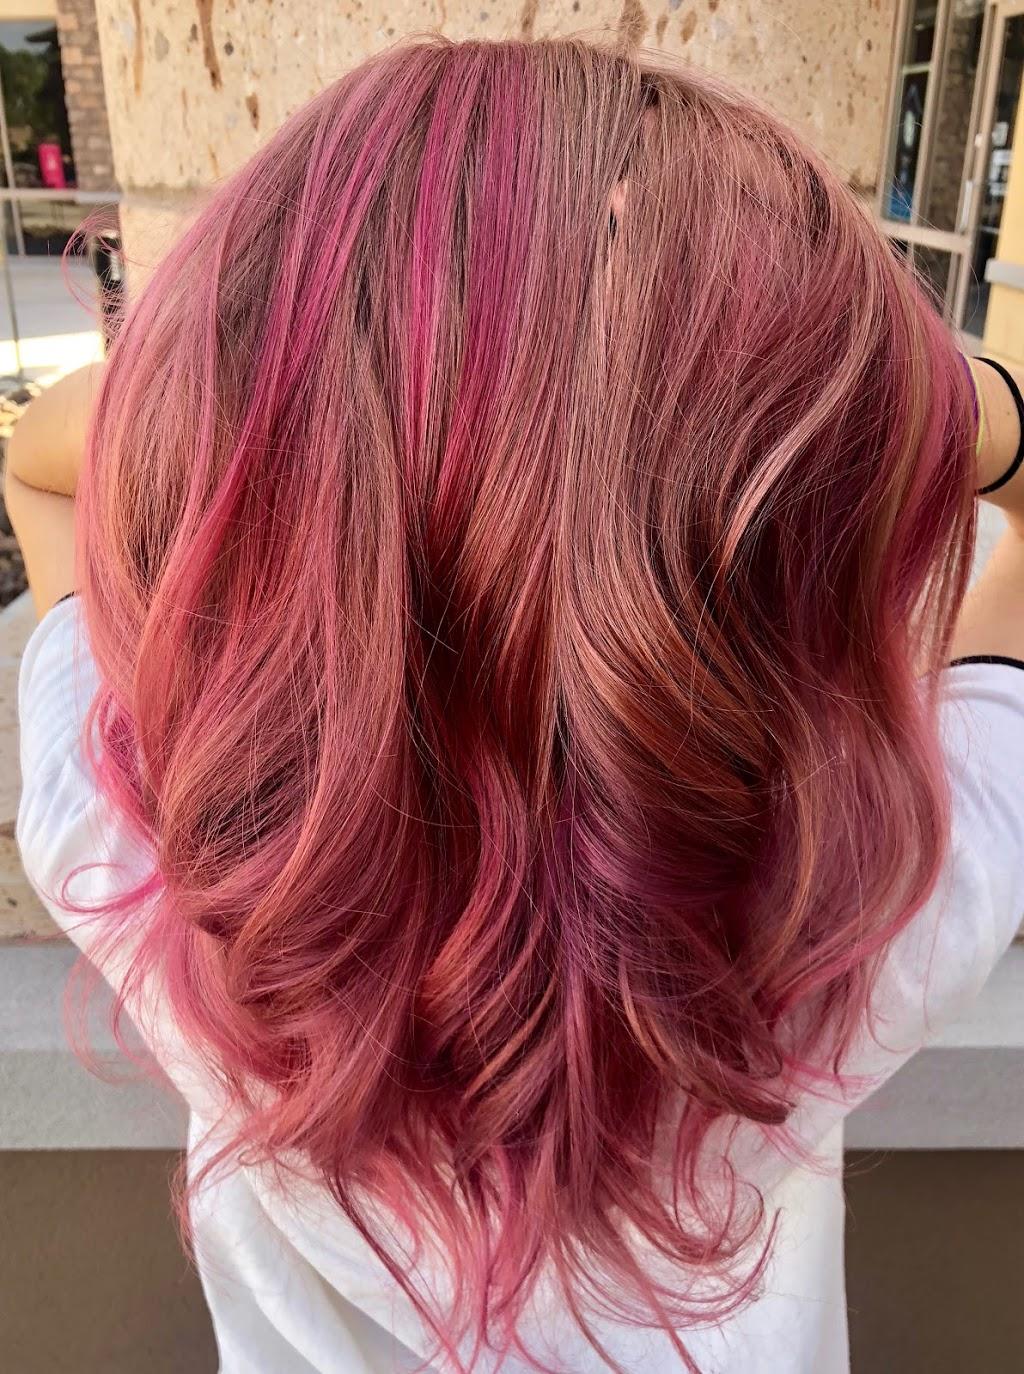 Emmi D SalonSpa - hair care    Photo 7 of 10   Address: 9343 E Shea Blvd B115, Scottsdale, AZ 85260, USA   Phone: (480) 451-0551